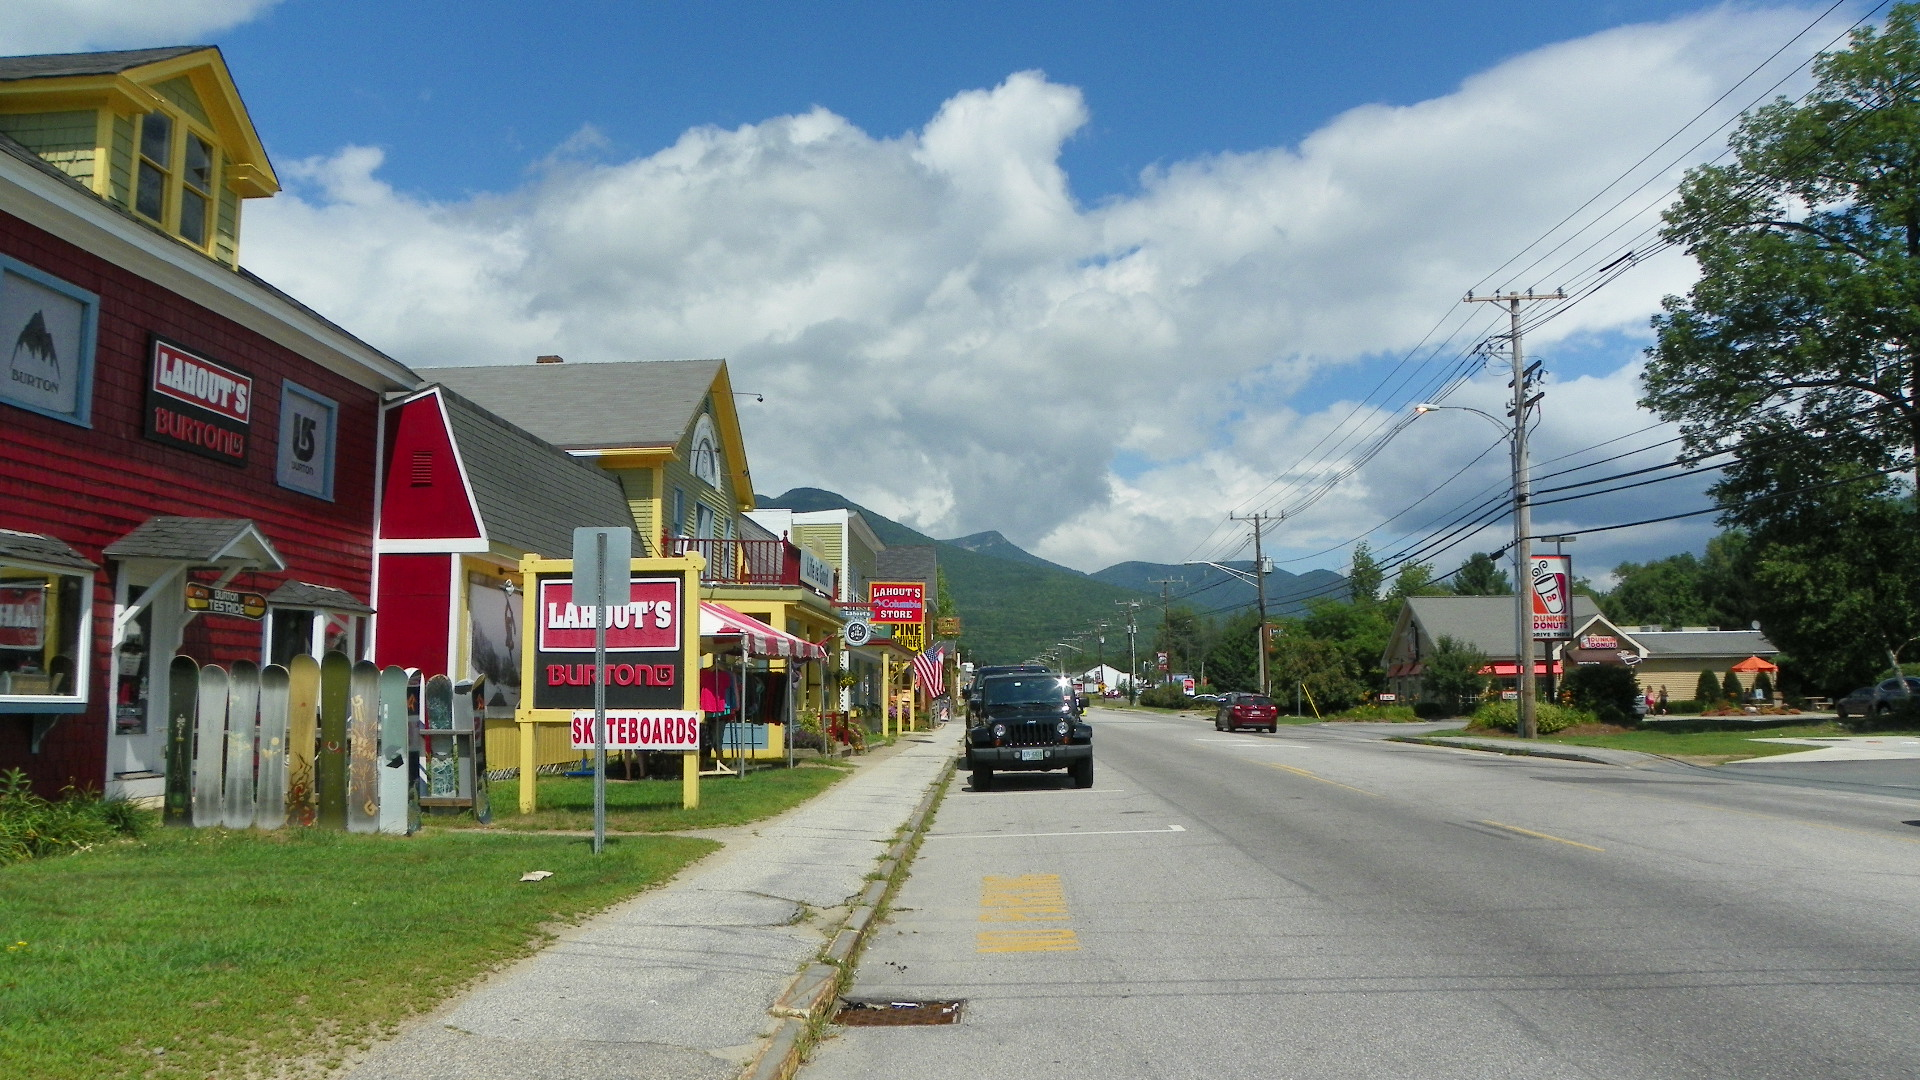 Lincoln - Woodstock - Loon Mountain Resort, a 4 season